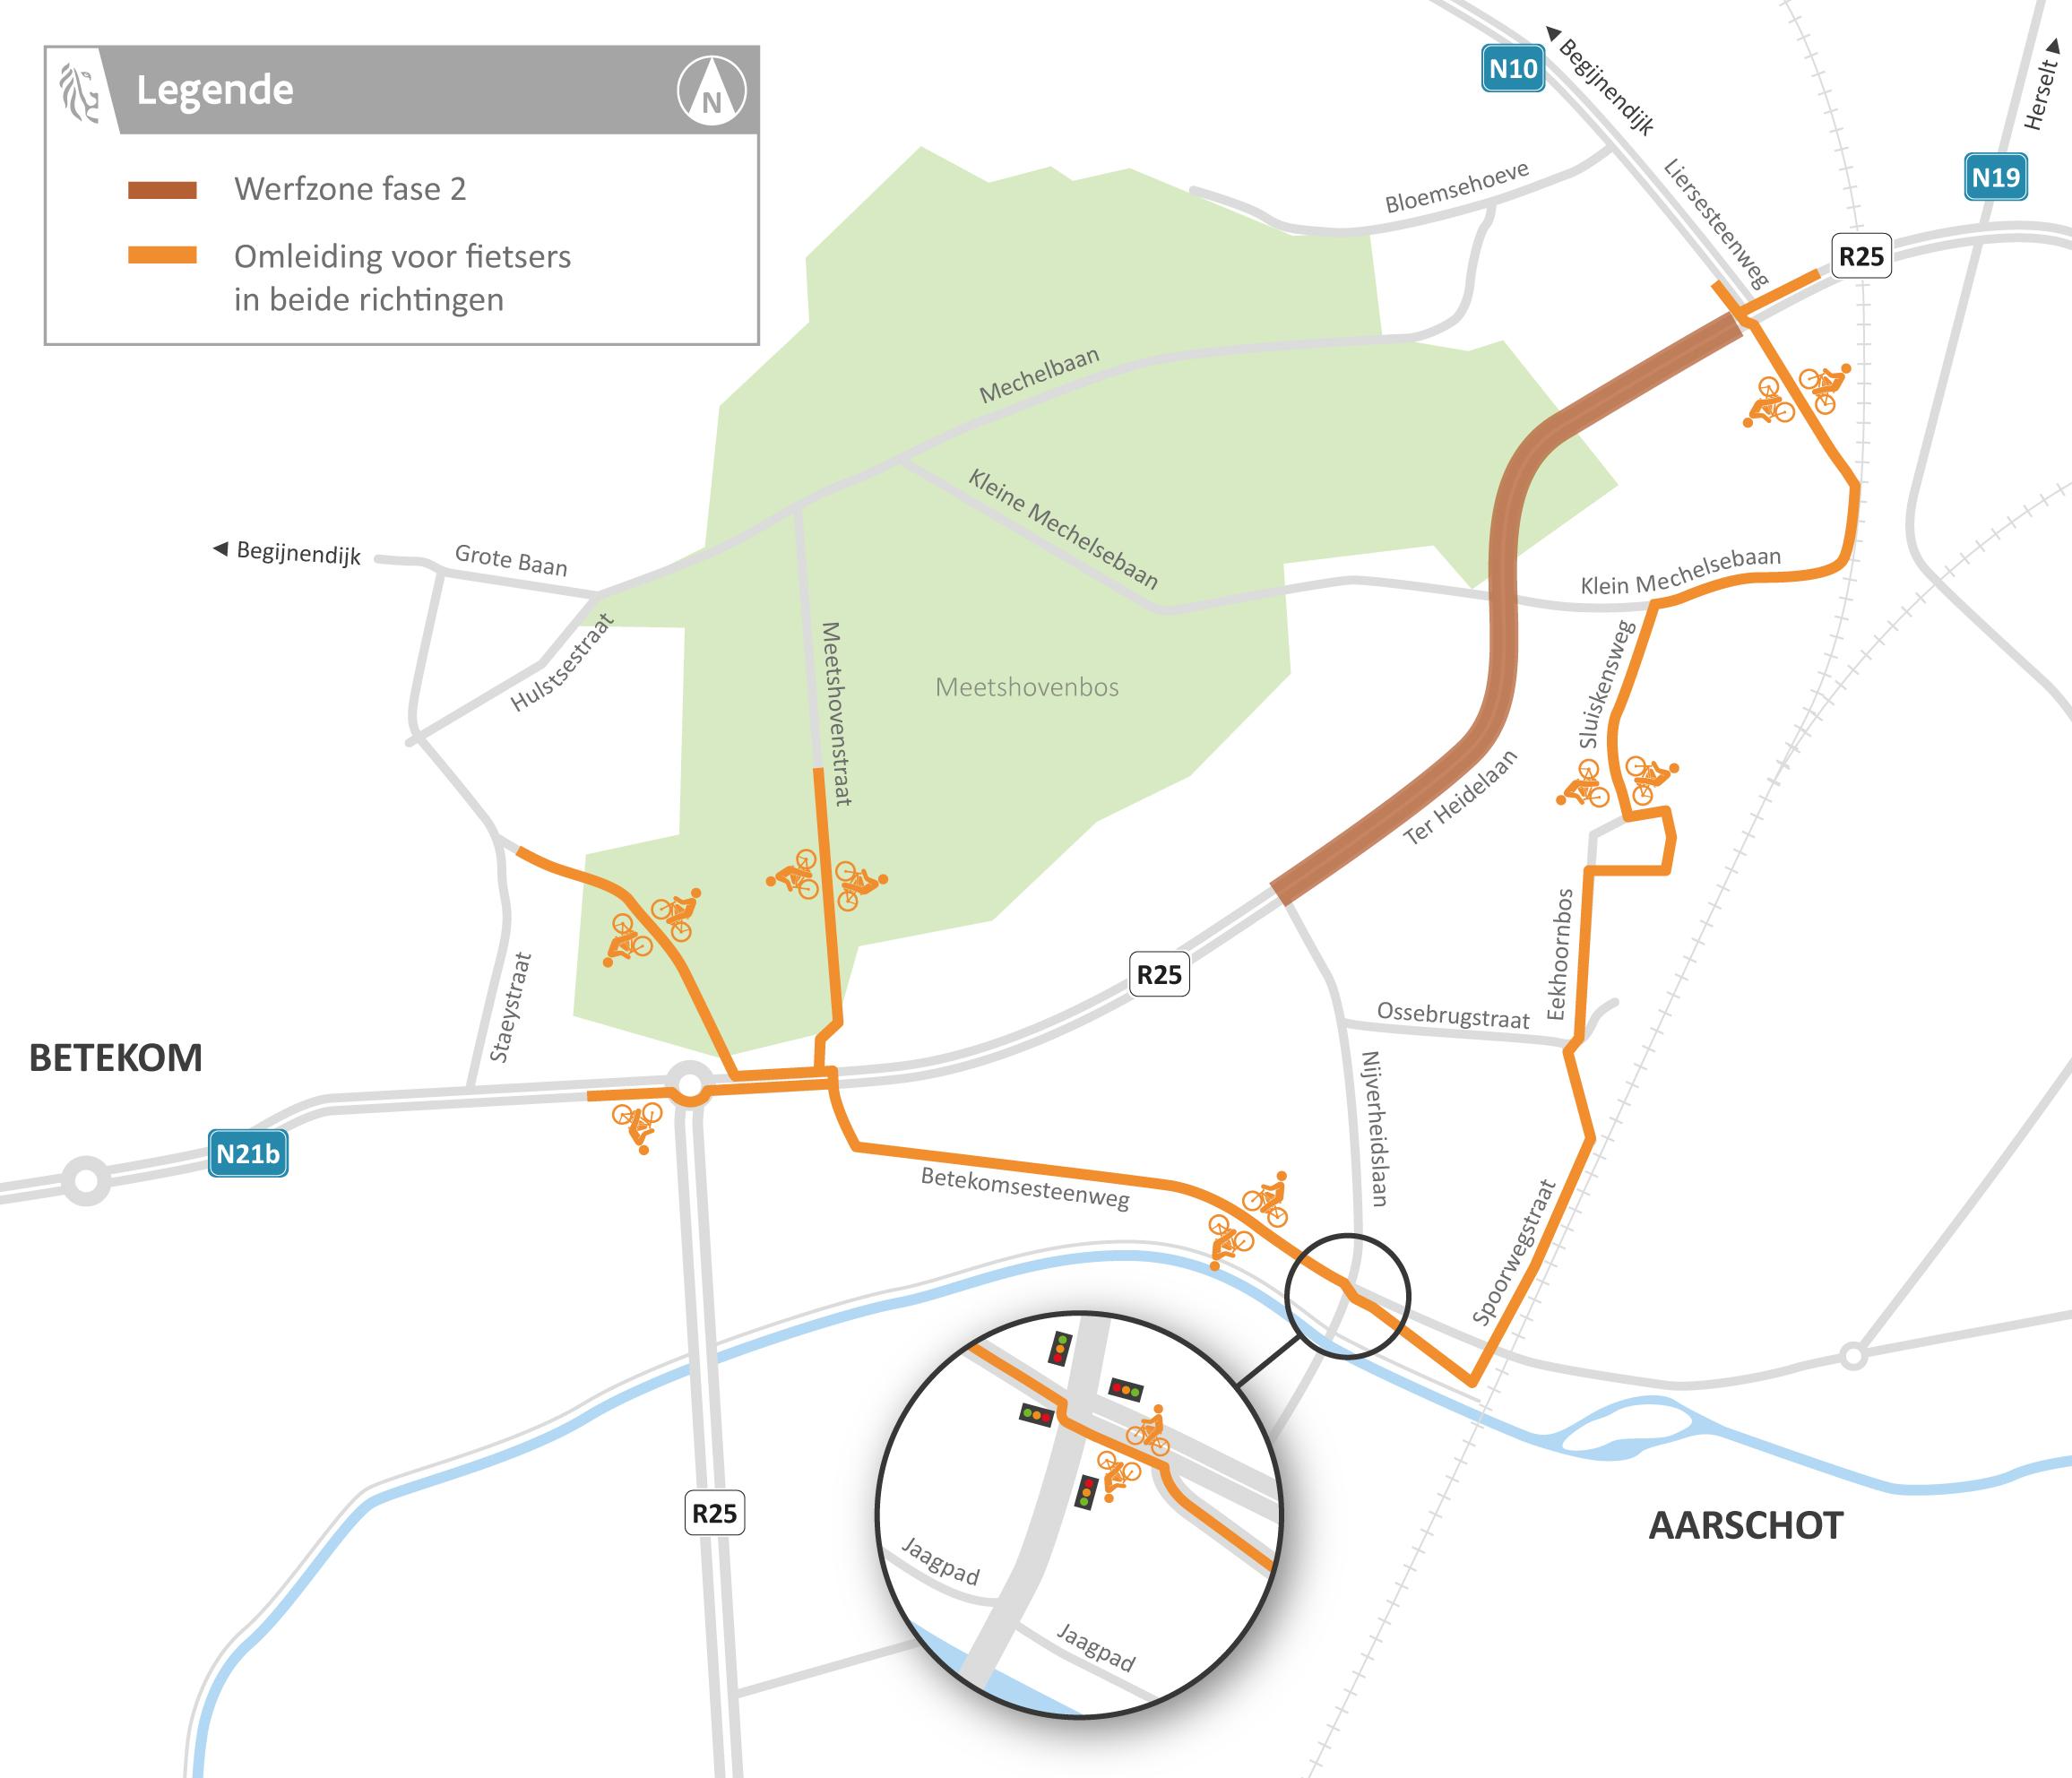 2021-03-9_AWV_BA_R25_Aarschot_fietsomleiding fase 2